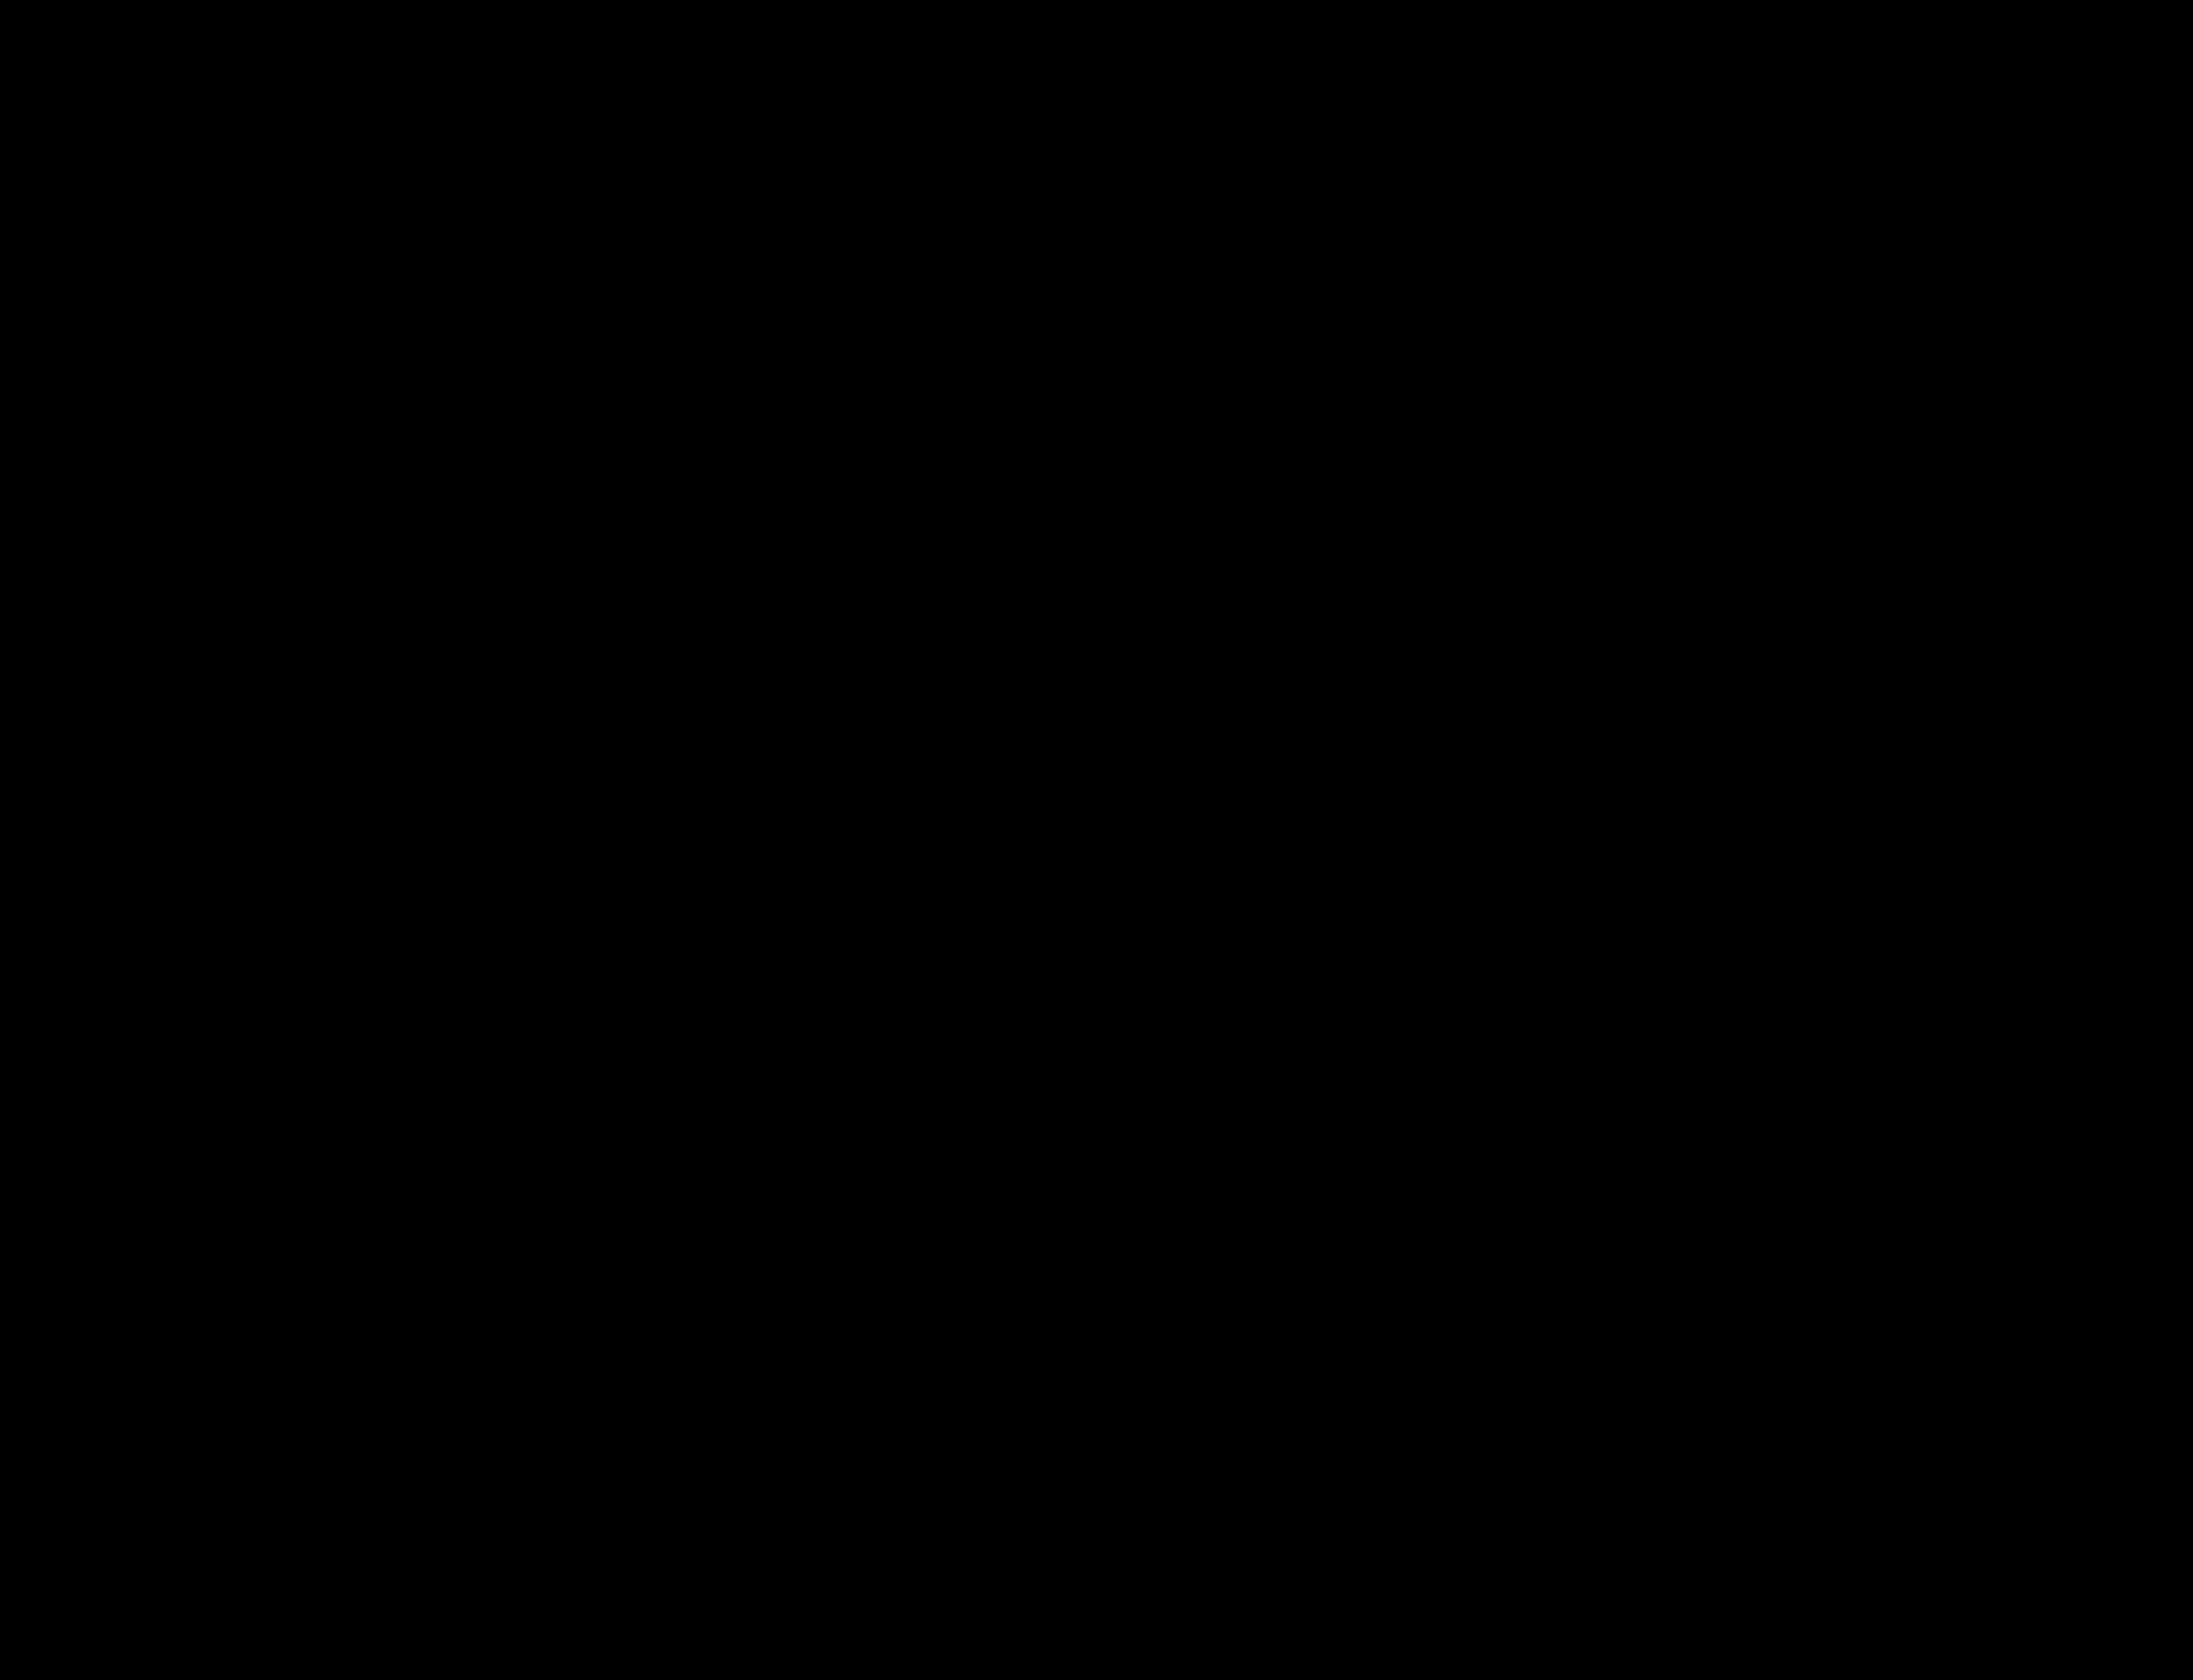 2400x1839 Clipart